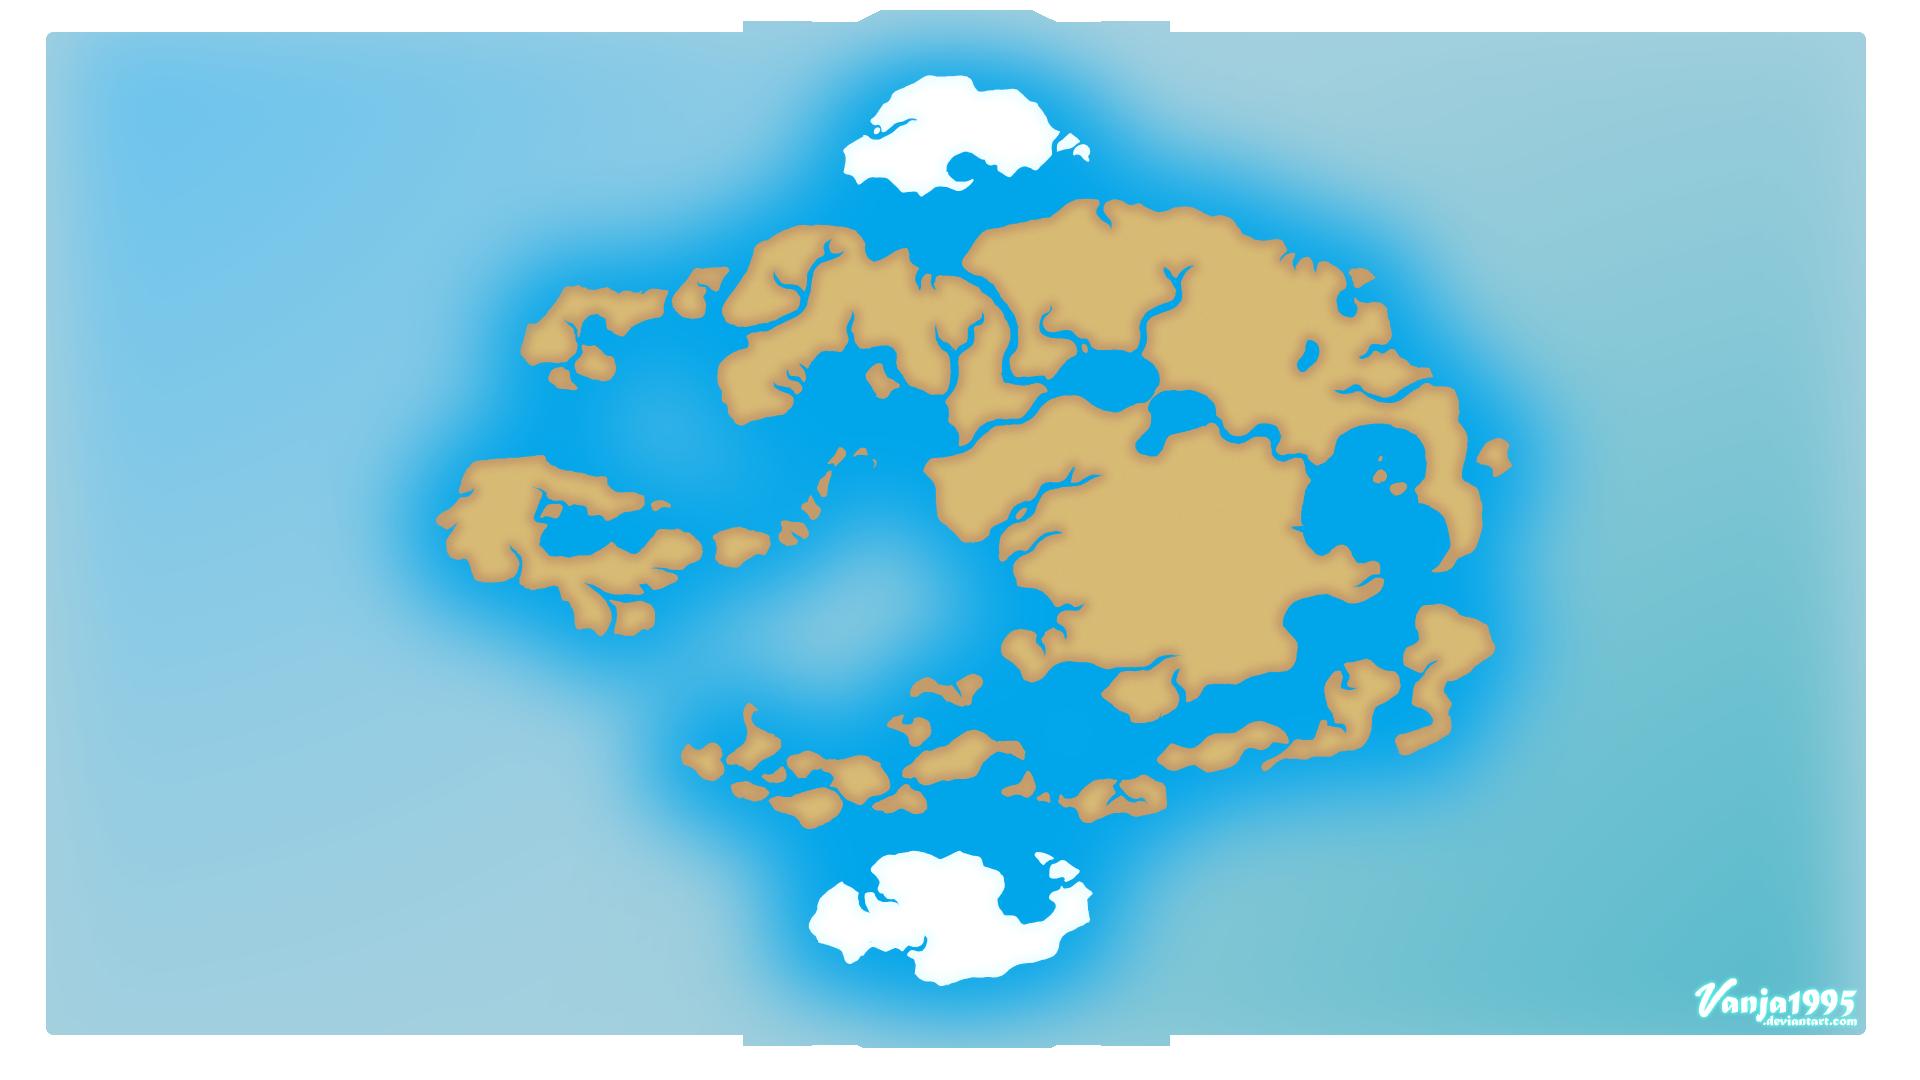 Avatar World Map by Vanja1995 on DeviantArt